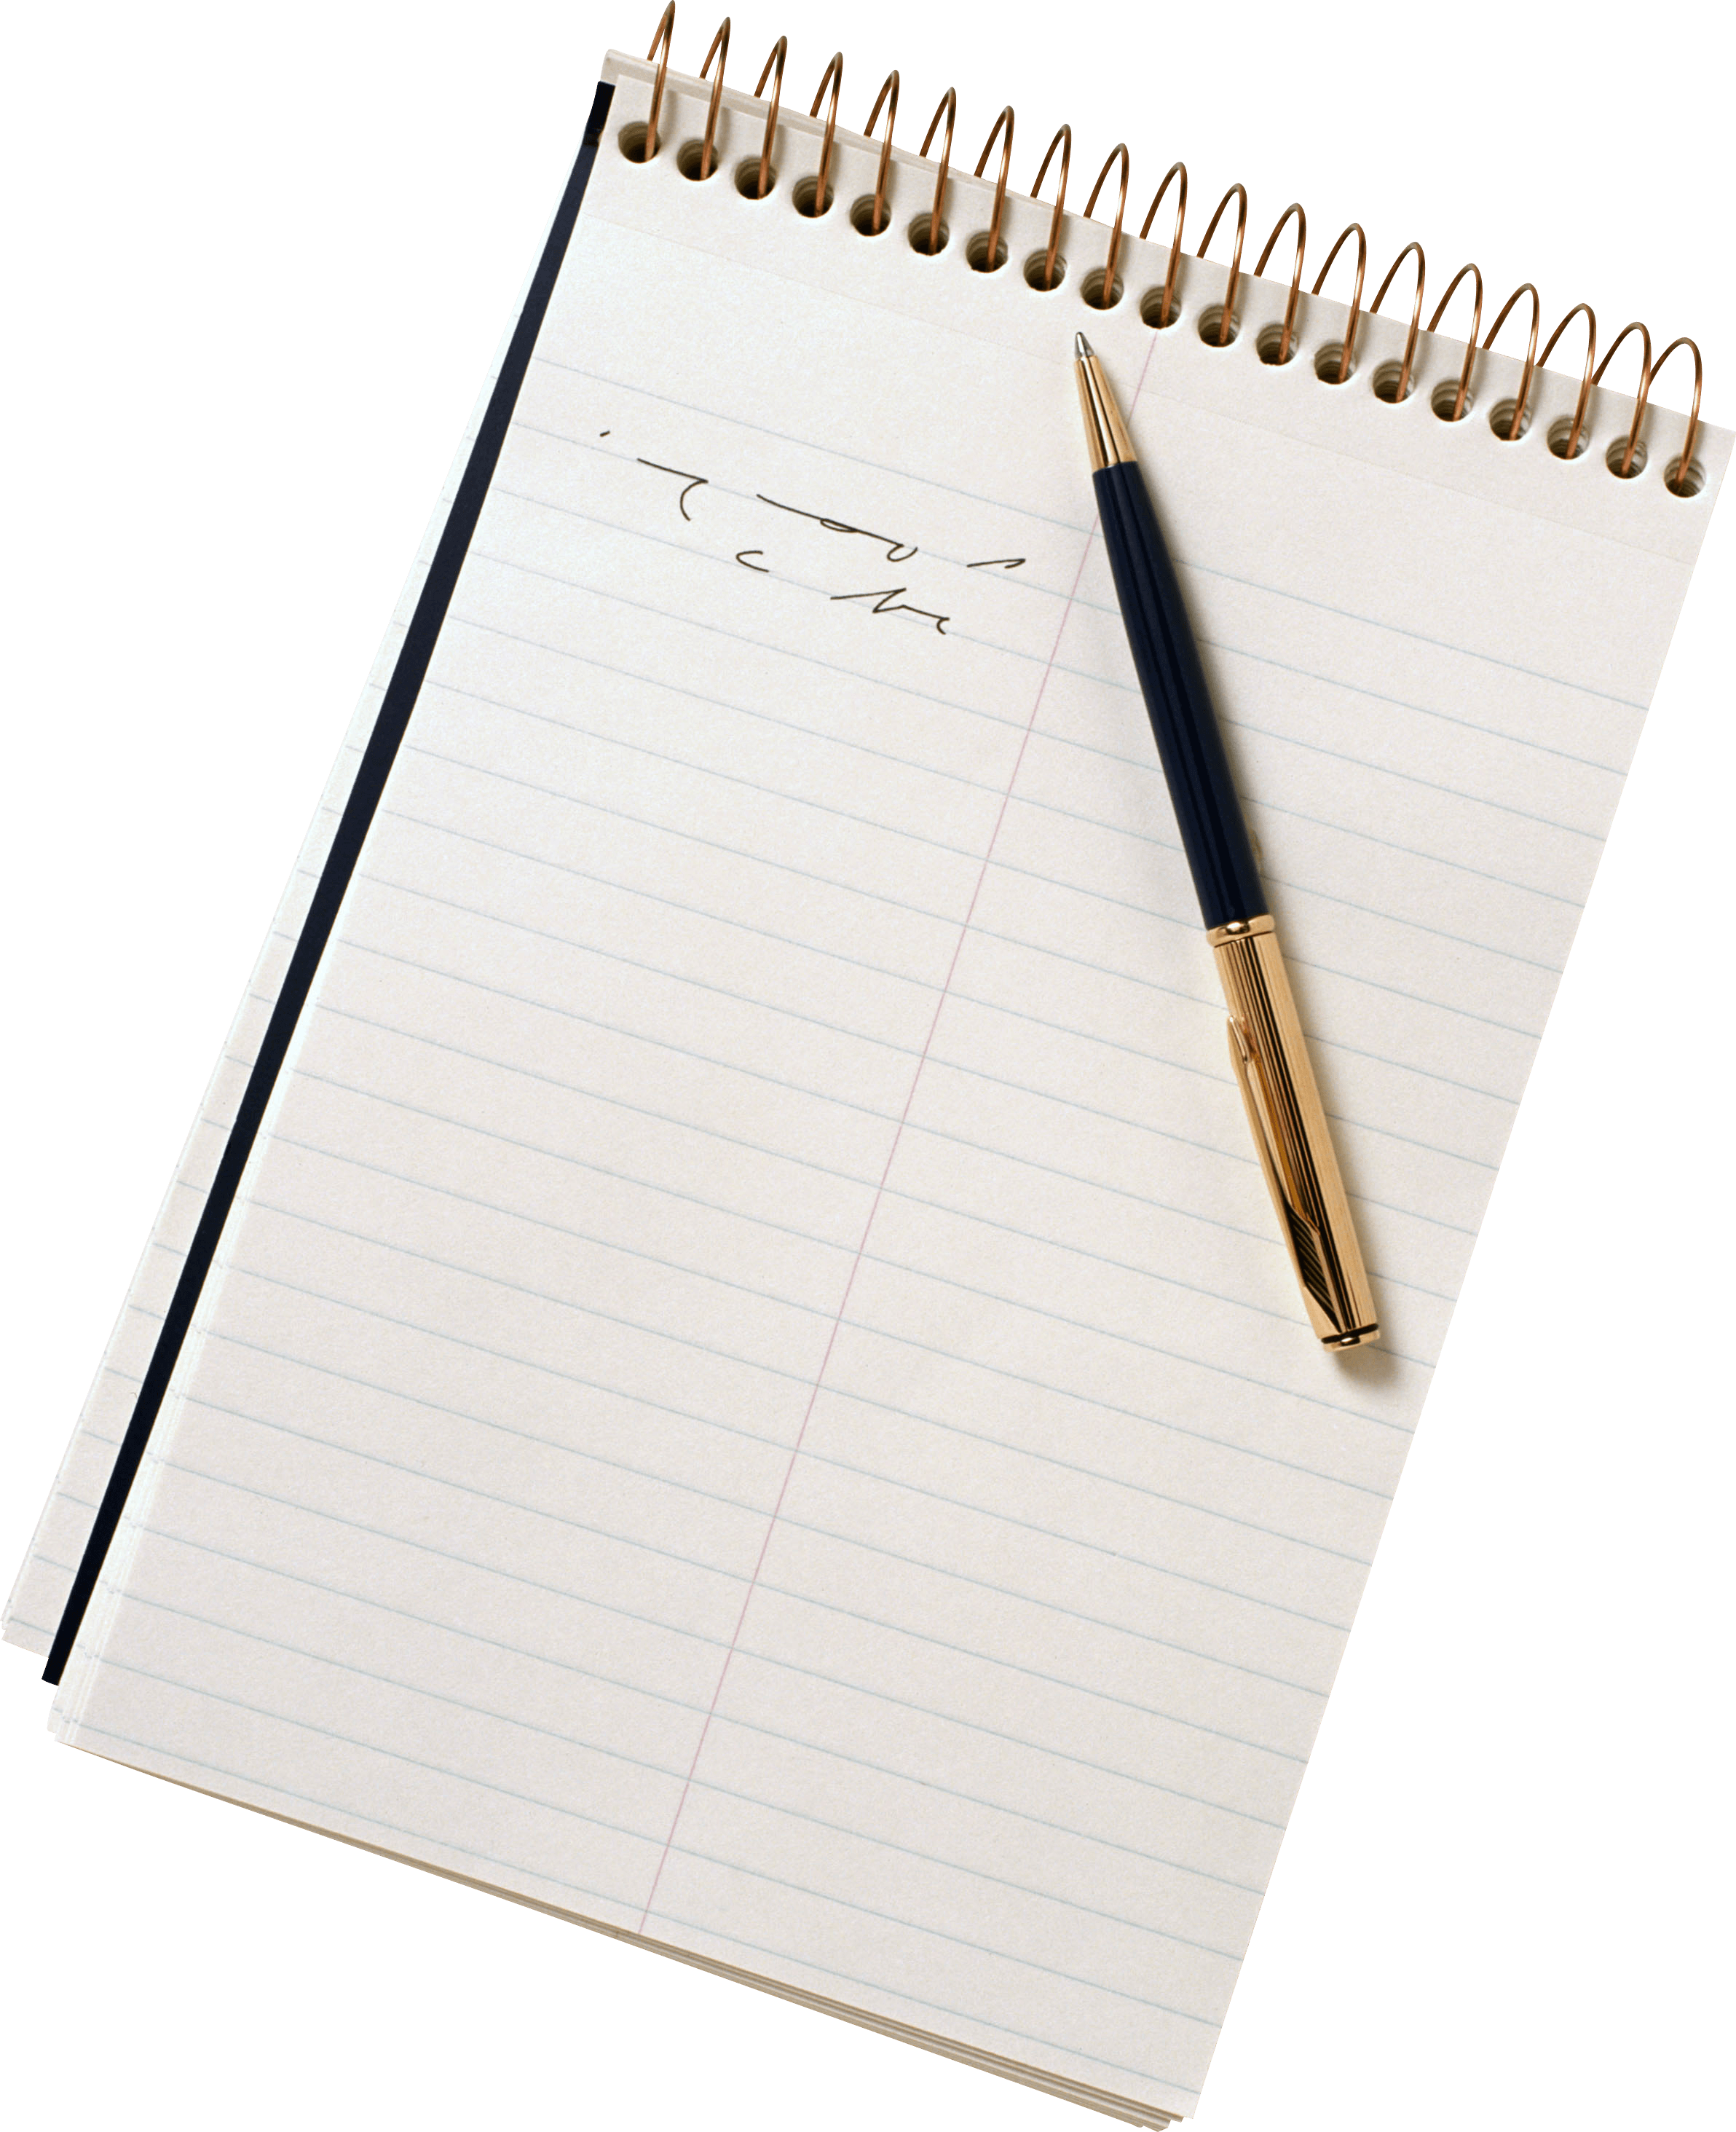 pen paper sheet transparent png - stickpng